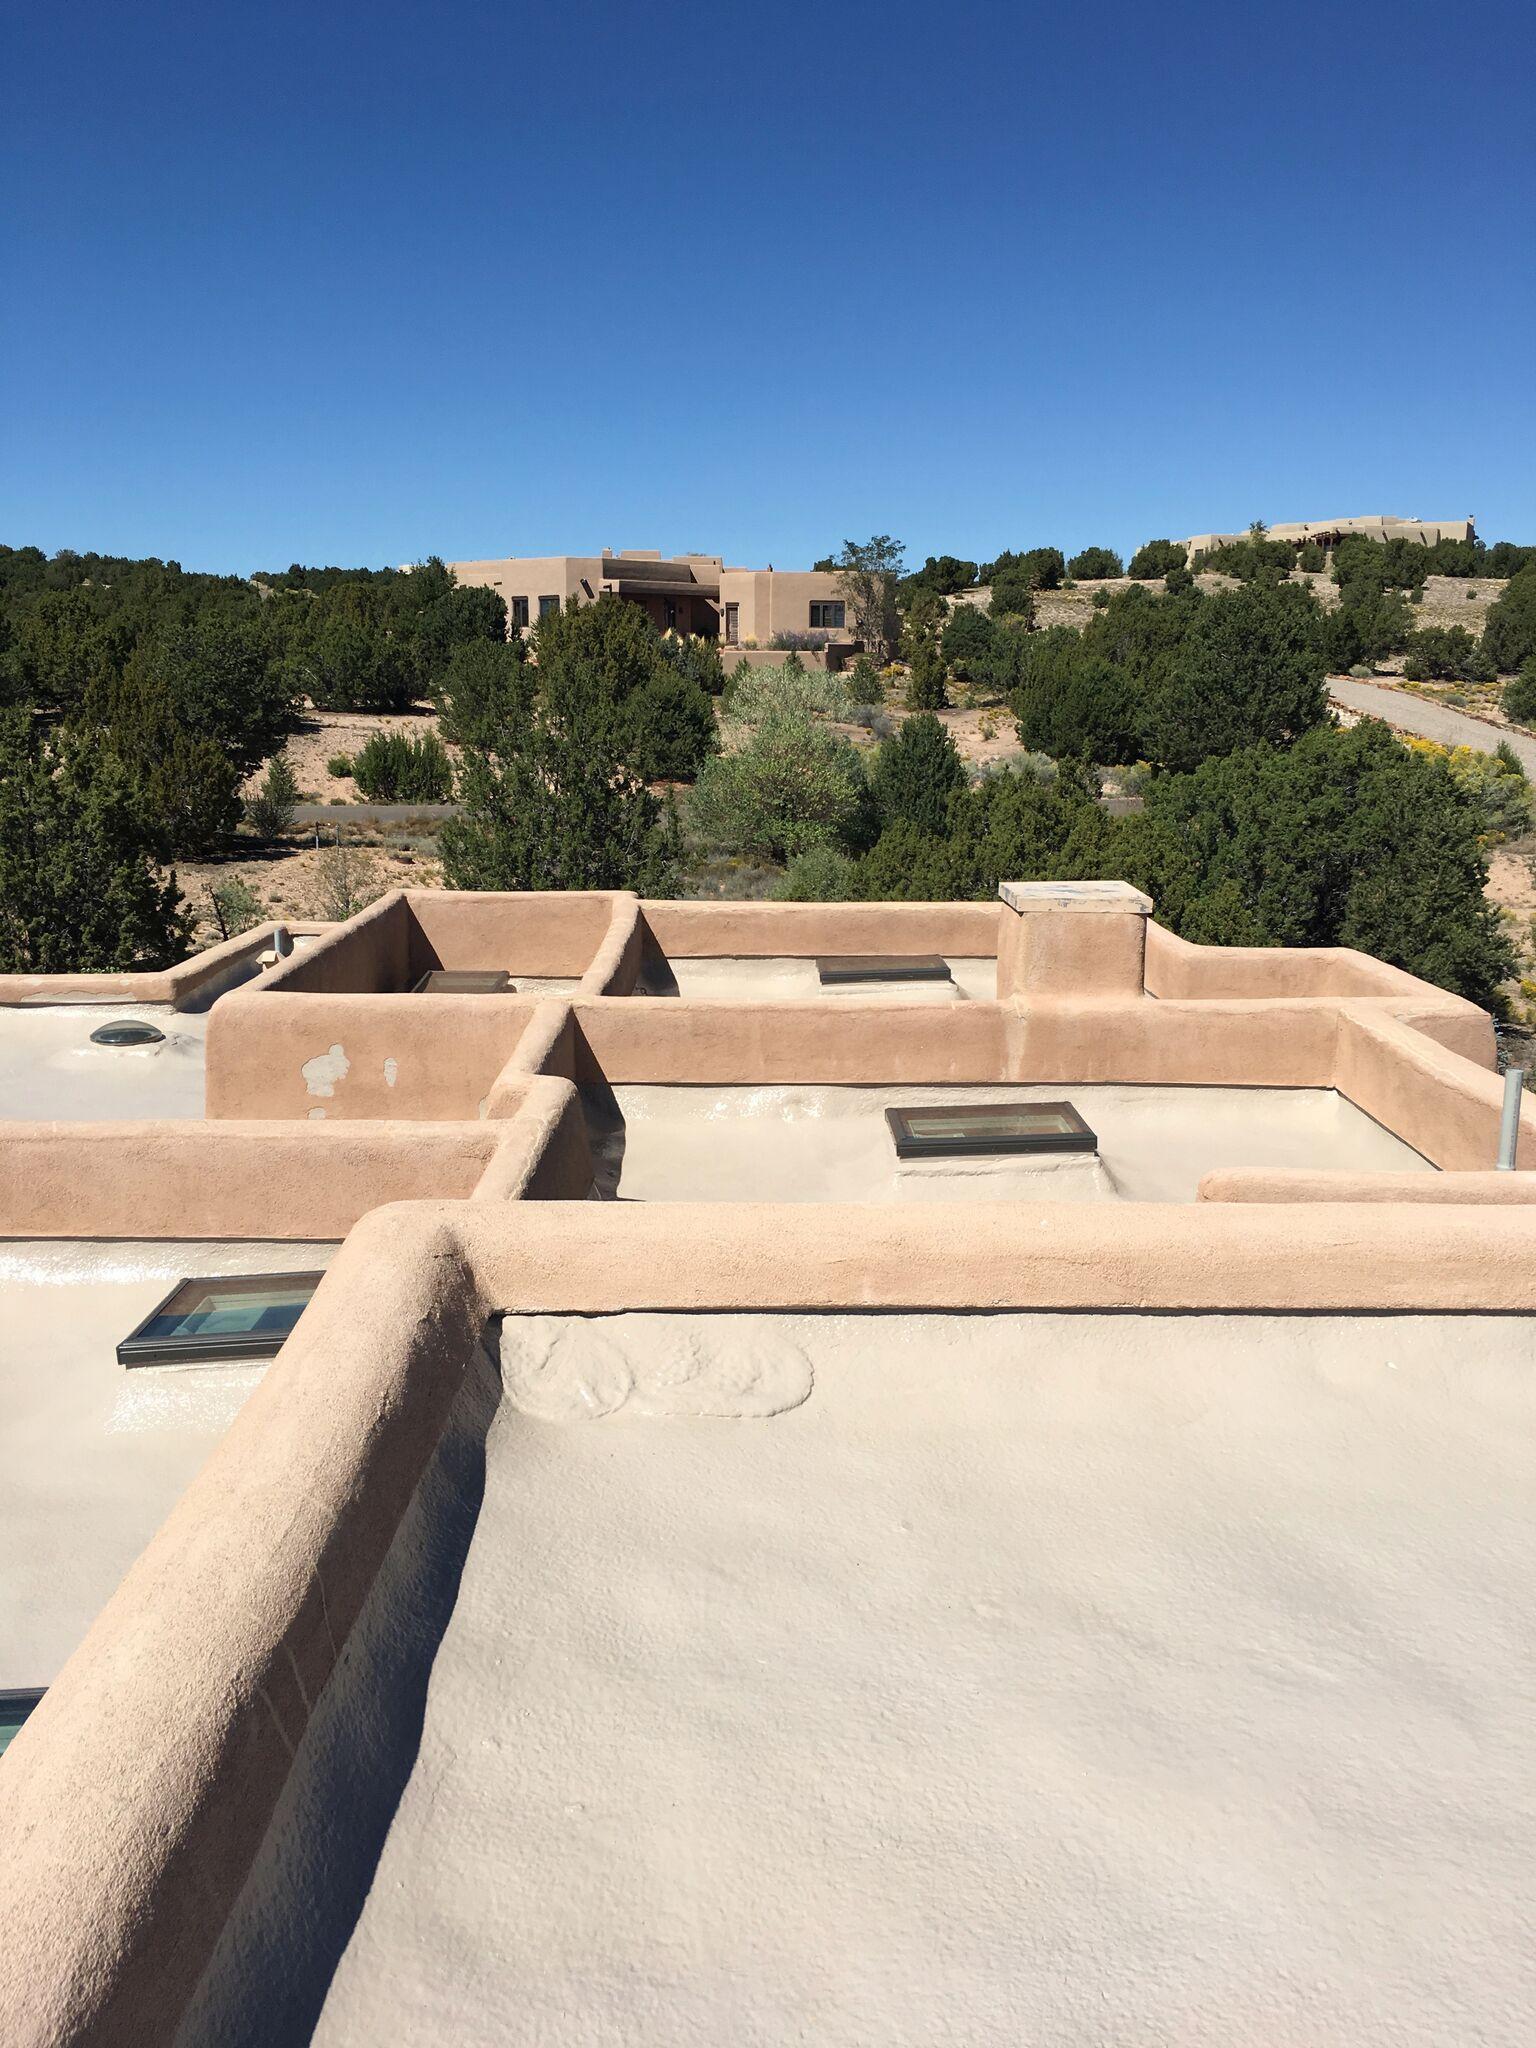 New Flat Roof in Santa Fe